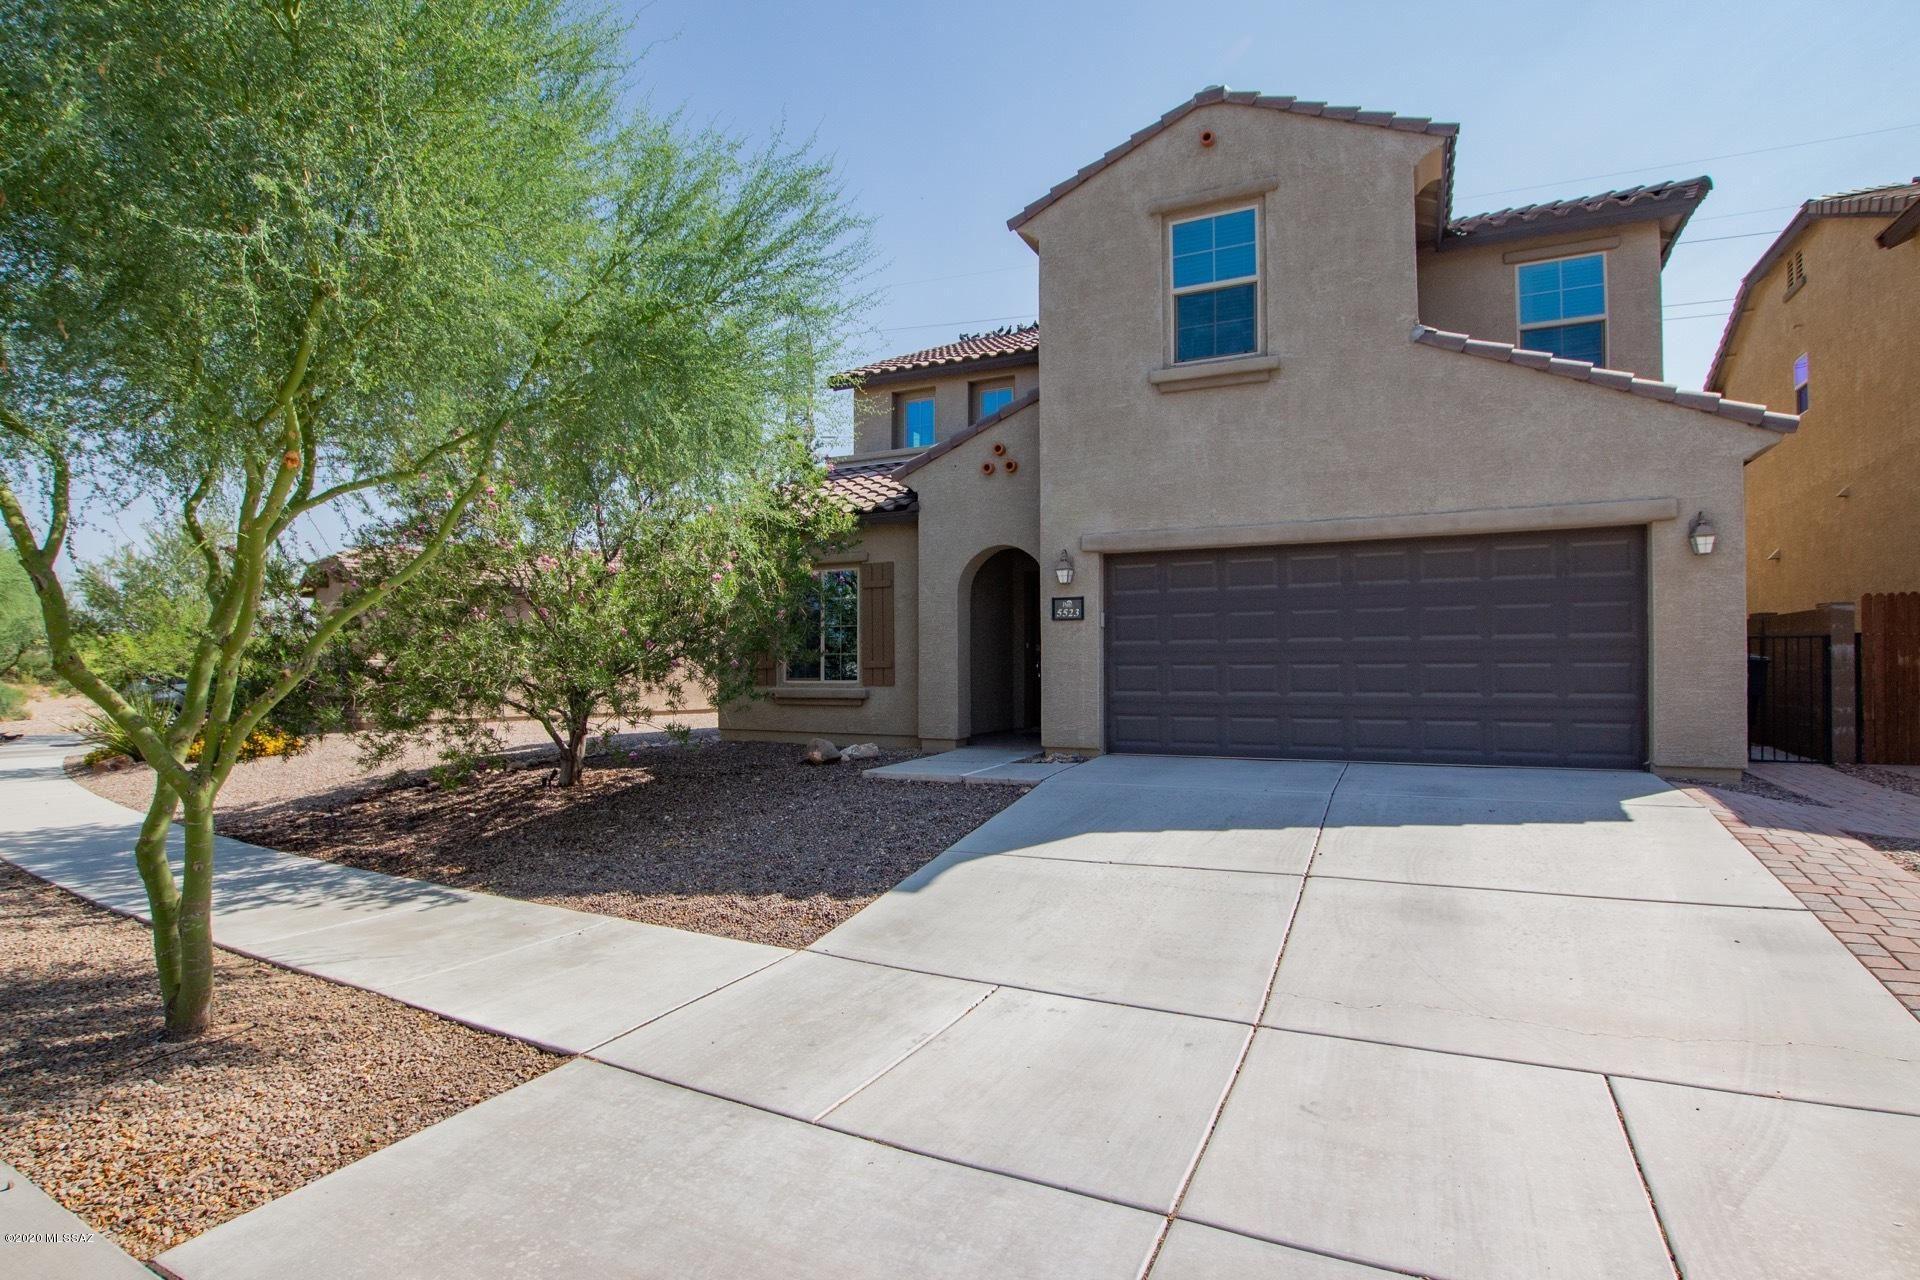 5523 S Sunrise Peak Road, Tucson, AZ 85747 - MLS#: 22022739